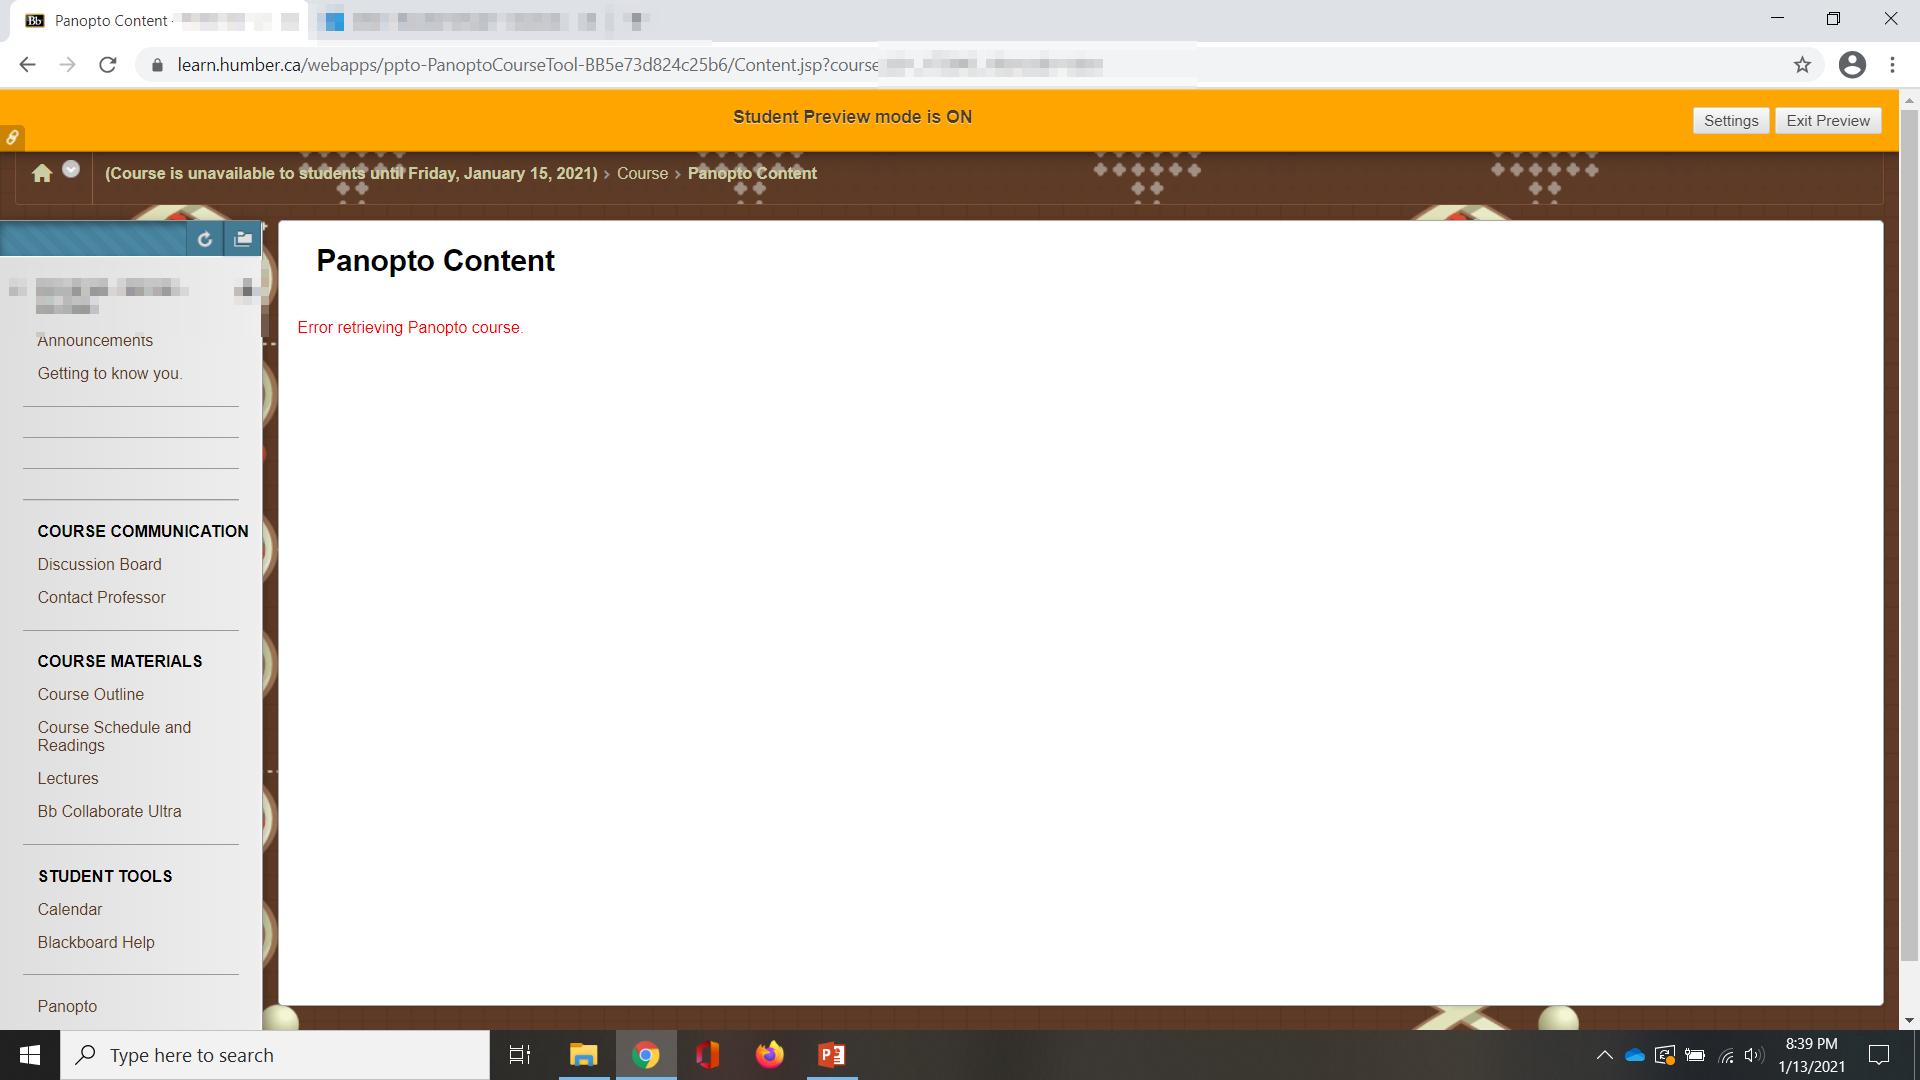 A screenshot of Panopto within Blackboard with error: Error retrieving Panopto course